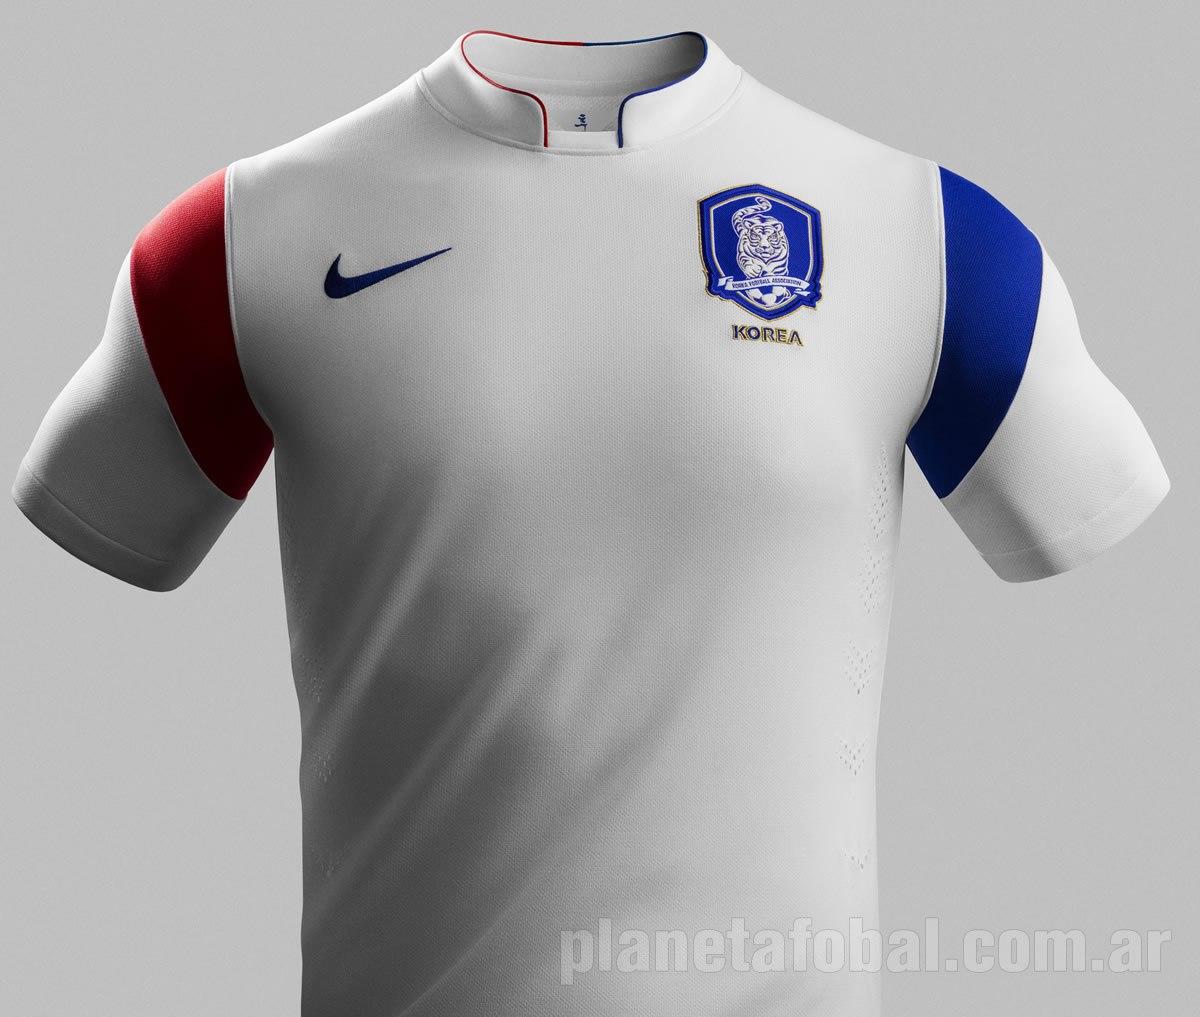 Del Fobal Planeta Camiseta Suplente Mundial Sur Nike 2014 Corea De OqfWrqnIZ